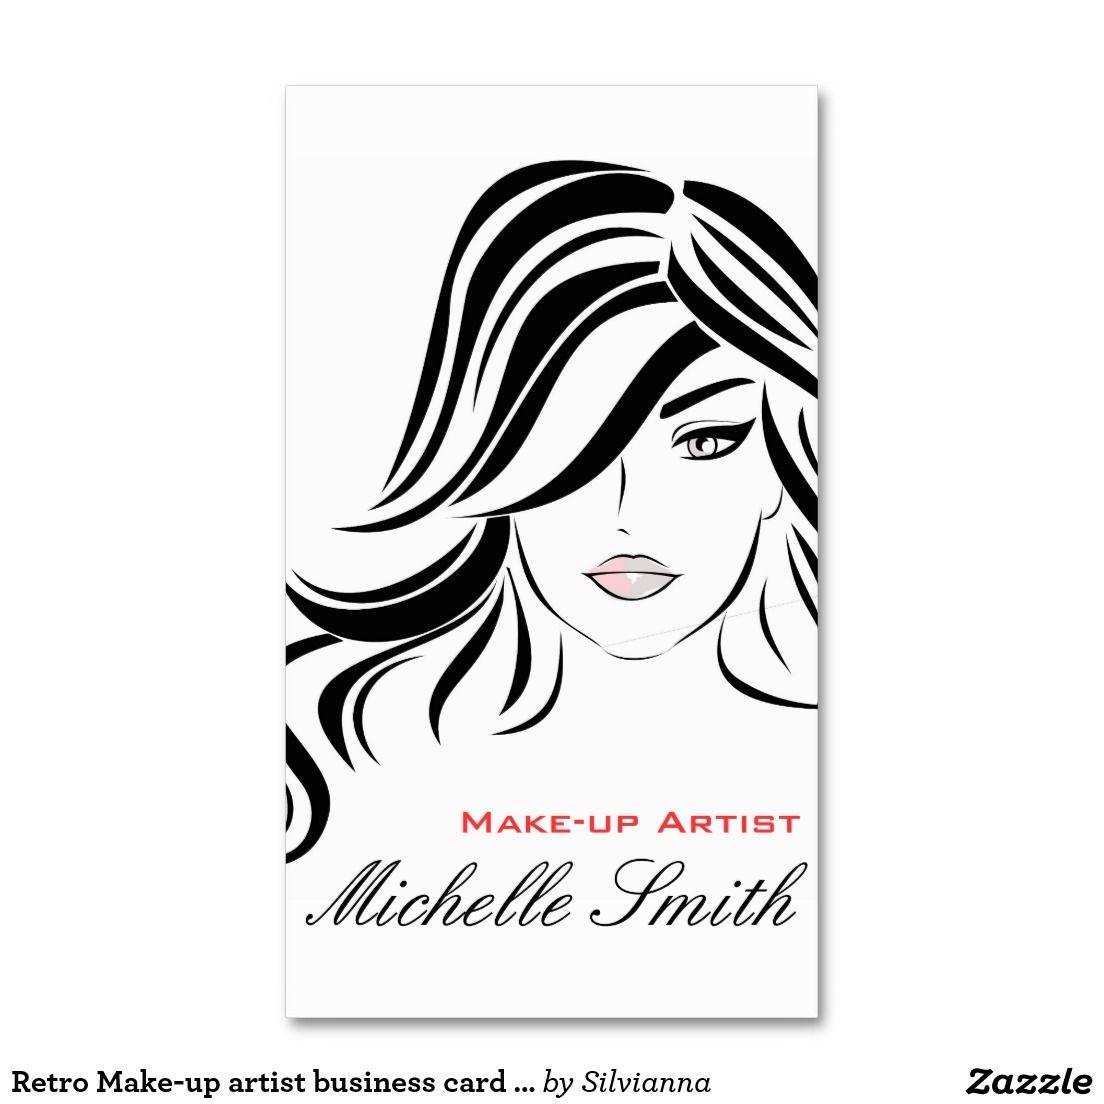 Retro Make-up artist business card design | Hair And Beauty Salon ...